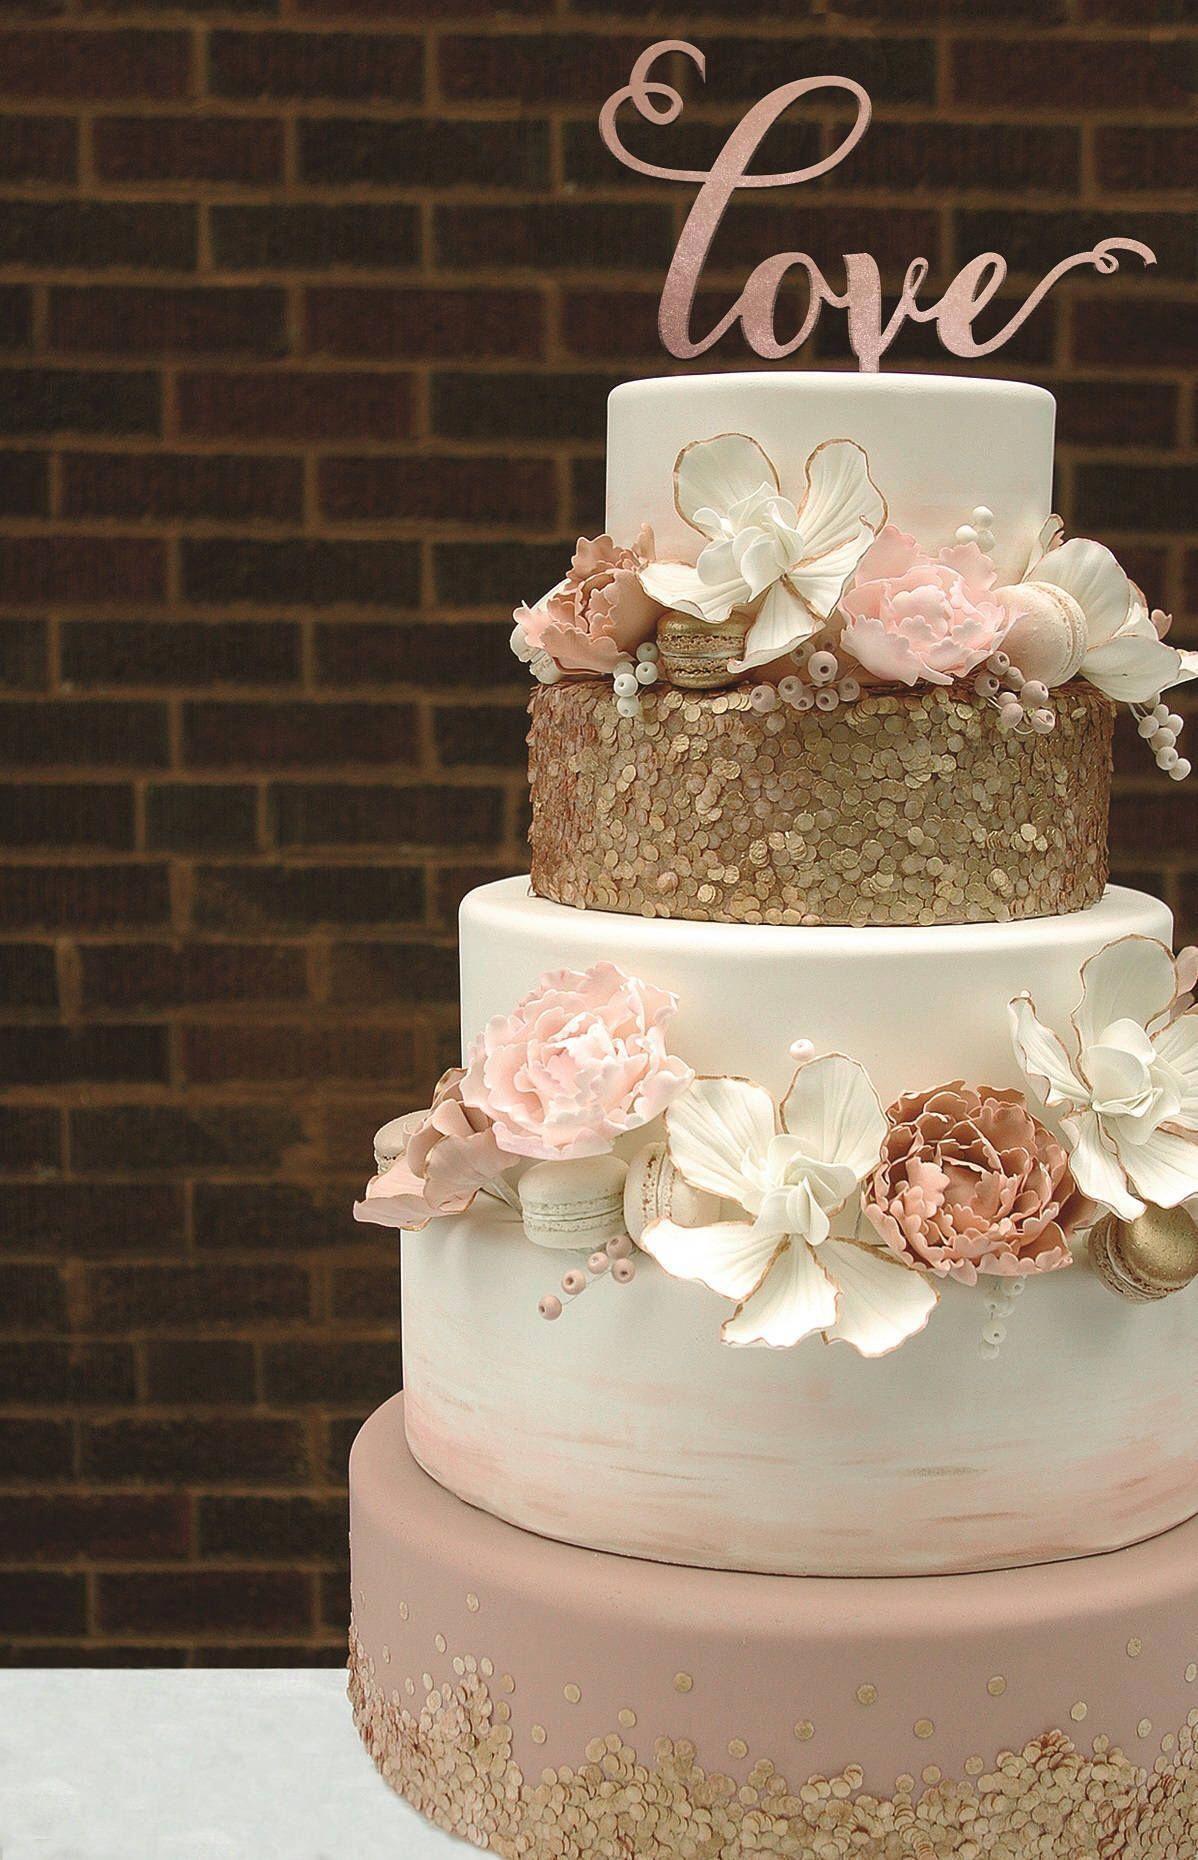 Rhubarb cake Recipe in 2020 Wedding cake roses, Bridal